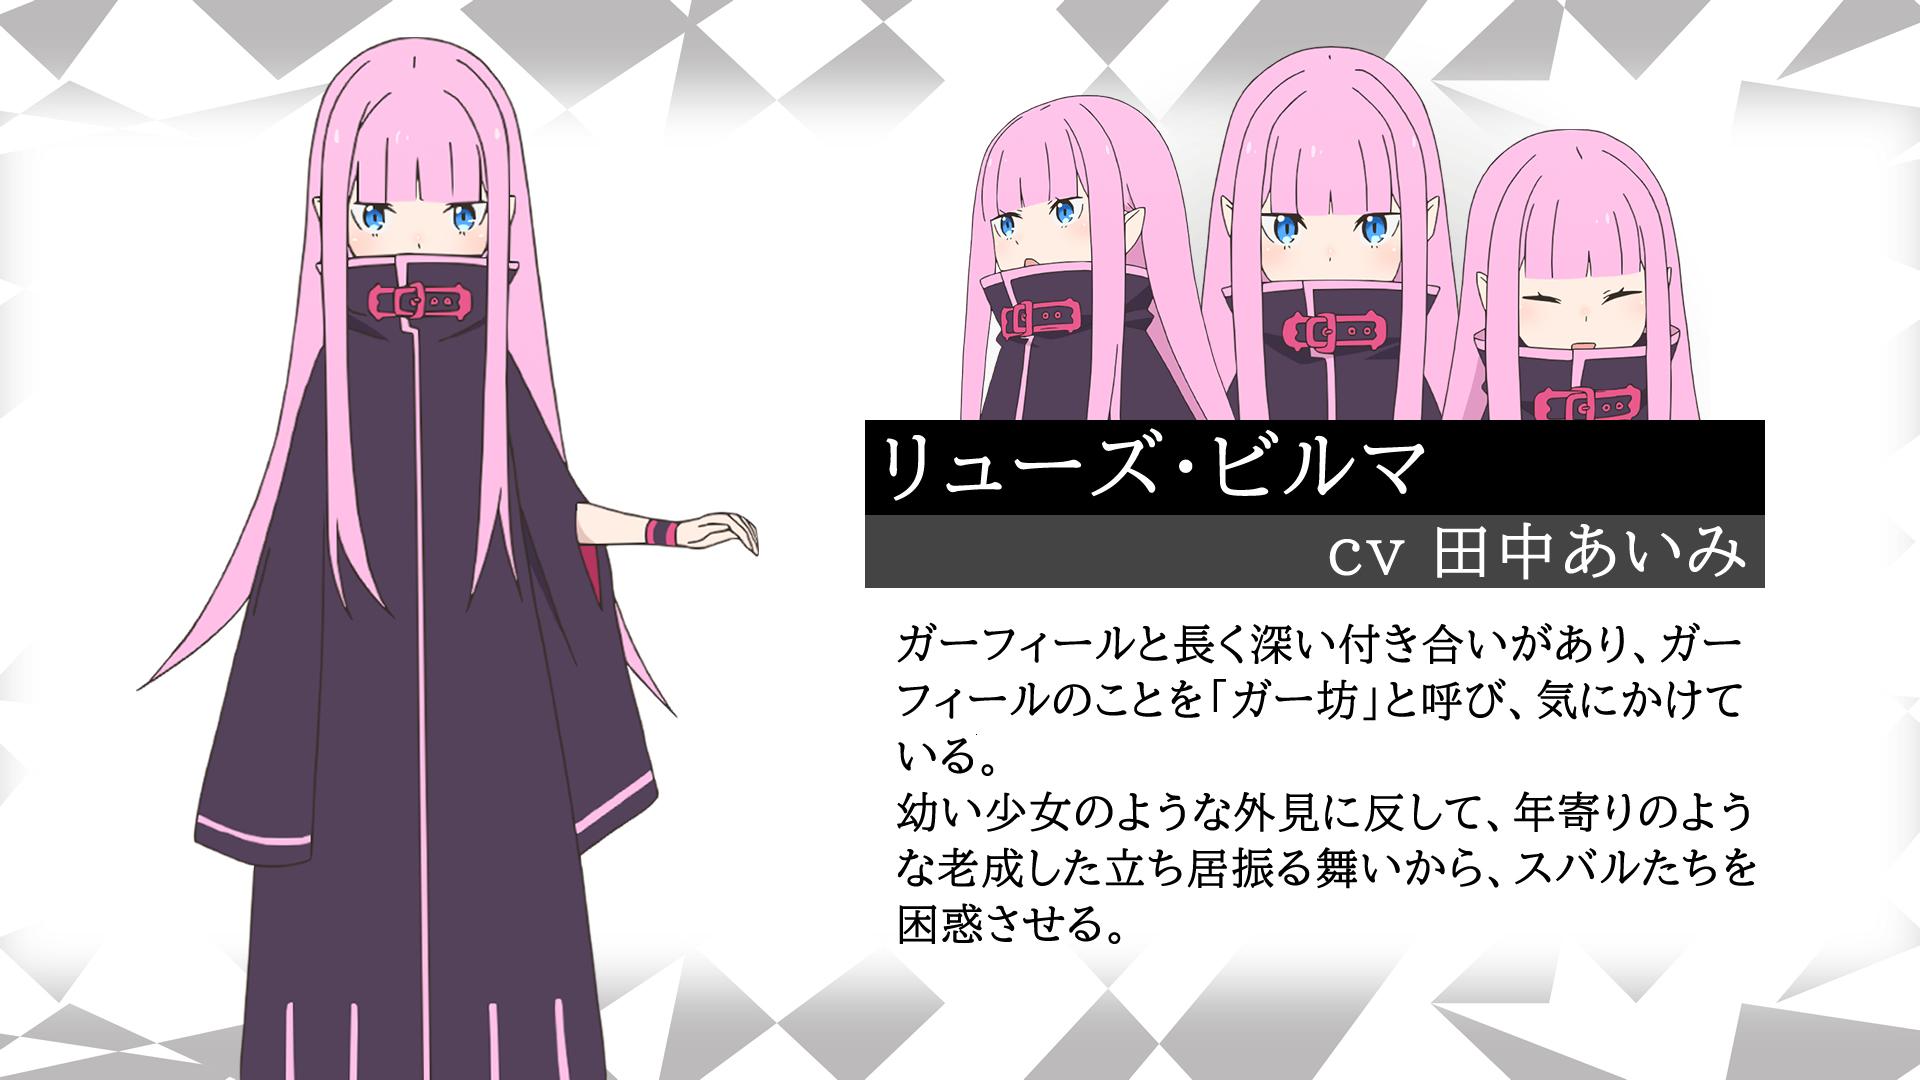 RE从零开始的异世界生活 第二季Rezero_official 1271061332658274304_p0